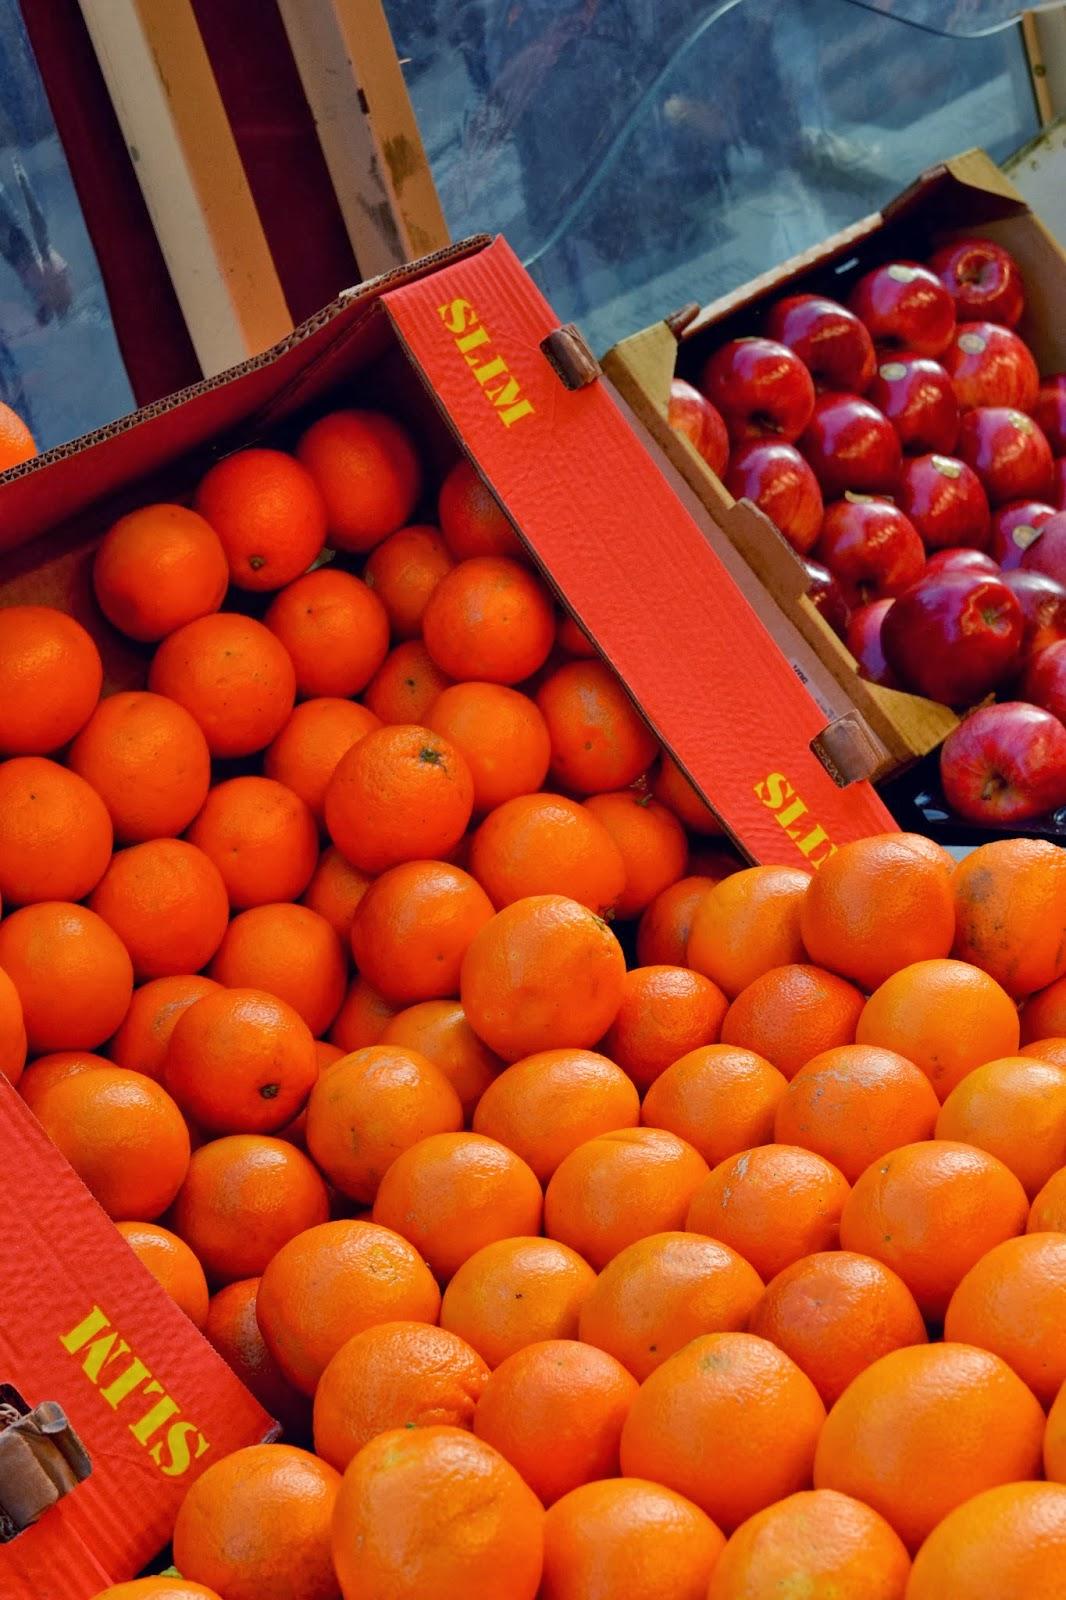 Oranges at a Parisian market